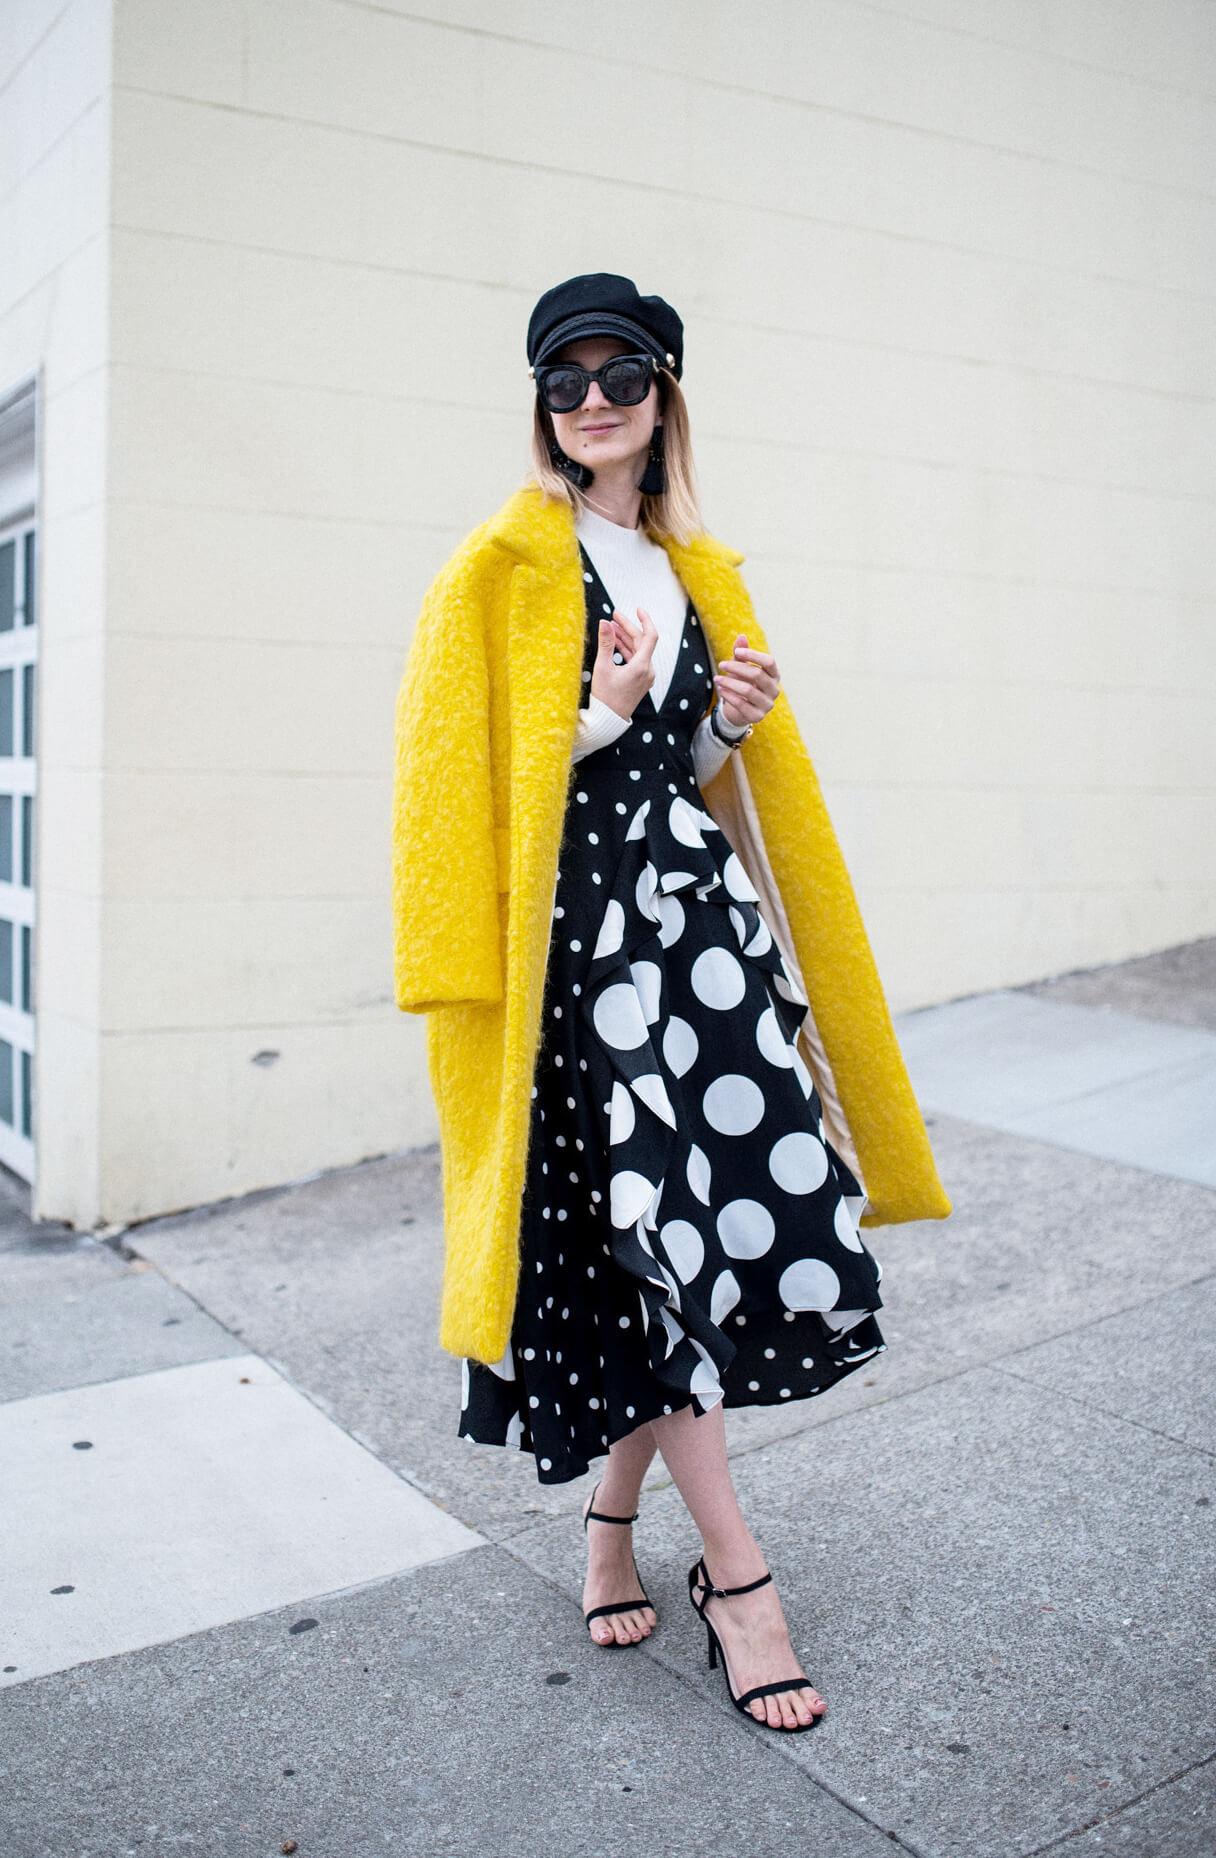 Topshop-Petite-Spot-Pinafore-Dress-Yello-WoolCoat.jpg